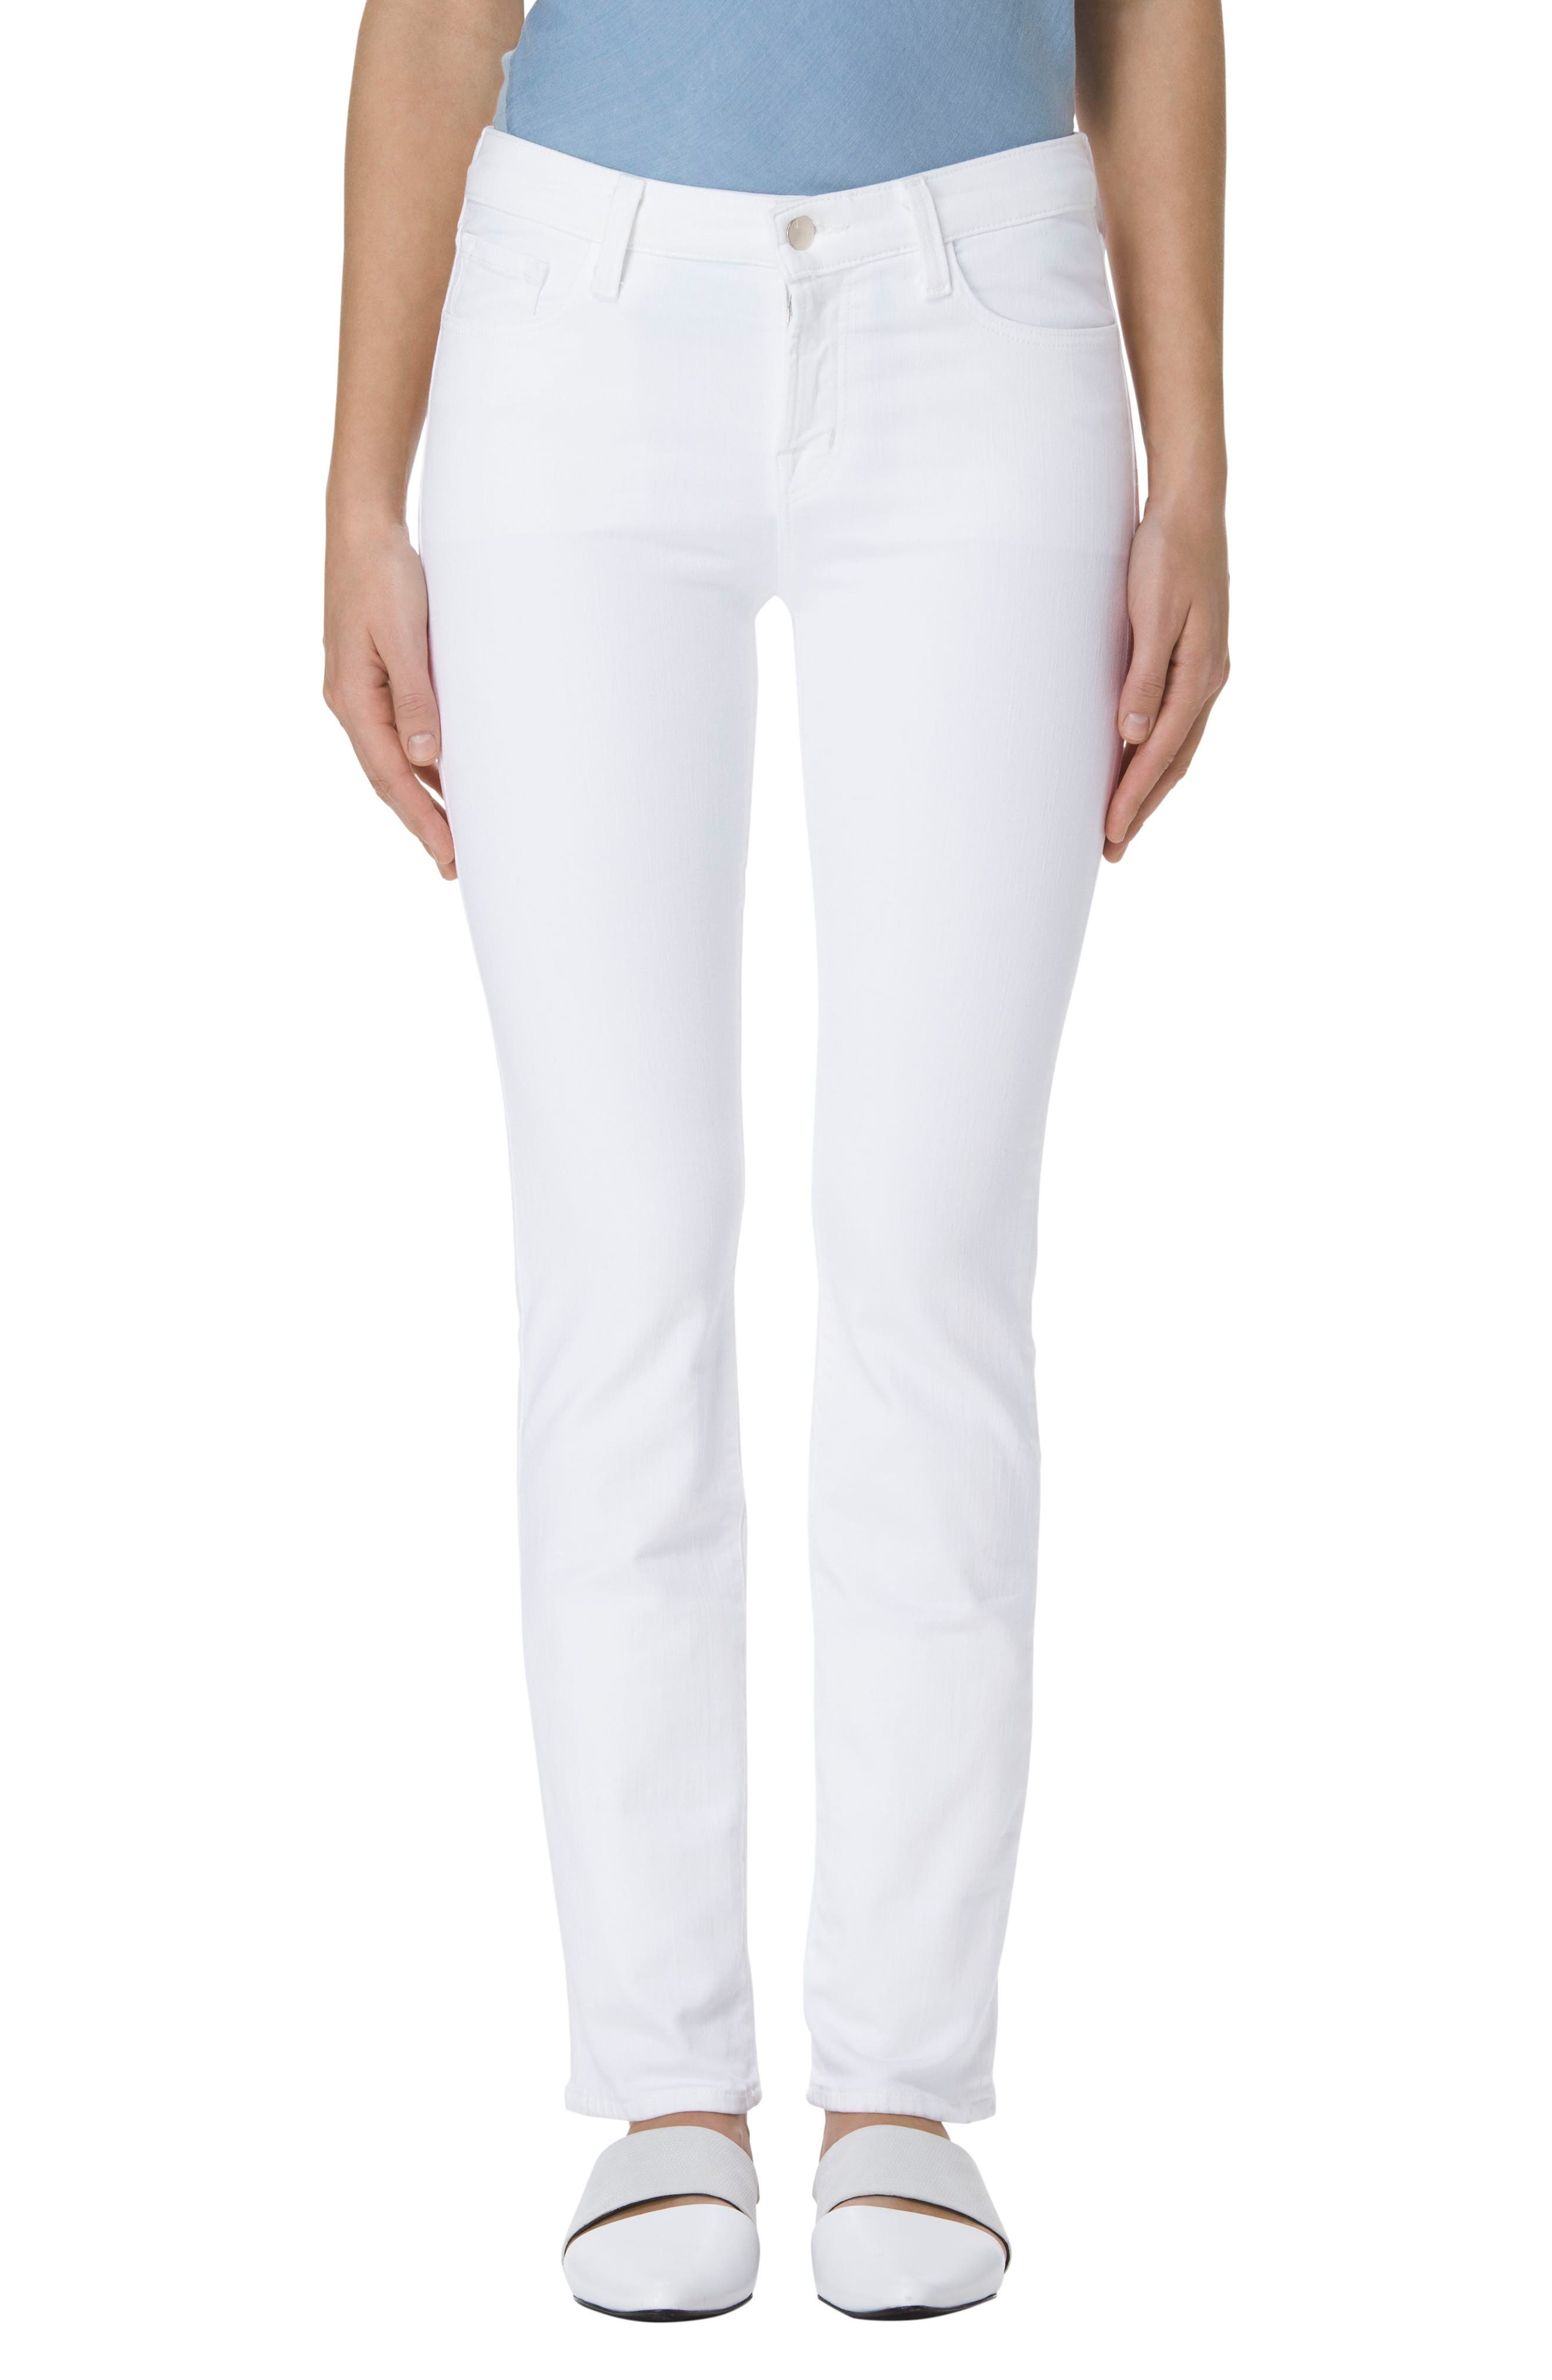 Main Image - J Brand Amelia Straight Leg Jeans (Blanc)